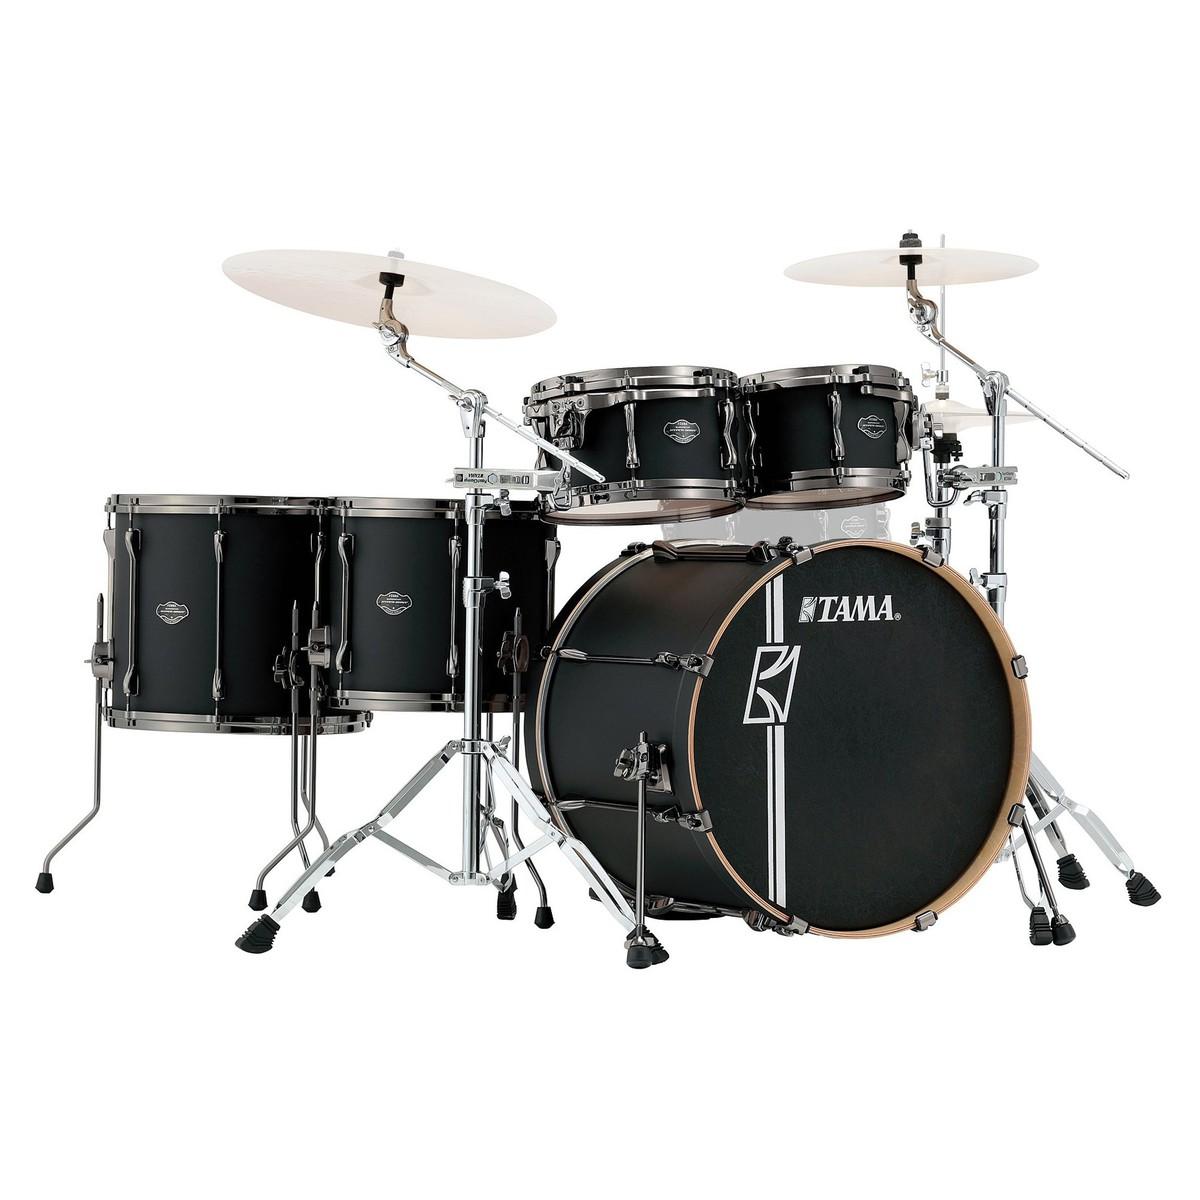 tama superstar hyper drive 22 39 39 5pc drum kit flat black at gear4music. Black Bedroom Furniture Sets. Home Design Ideas